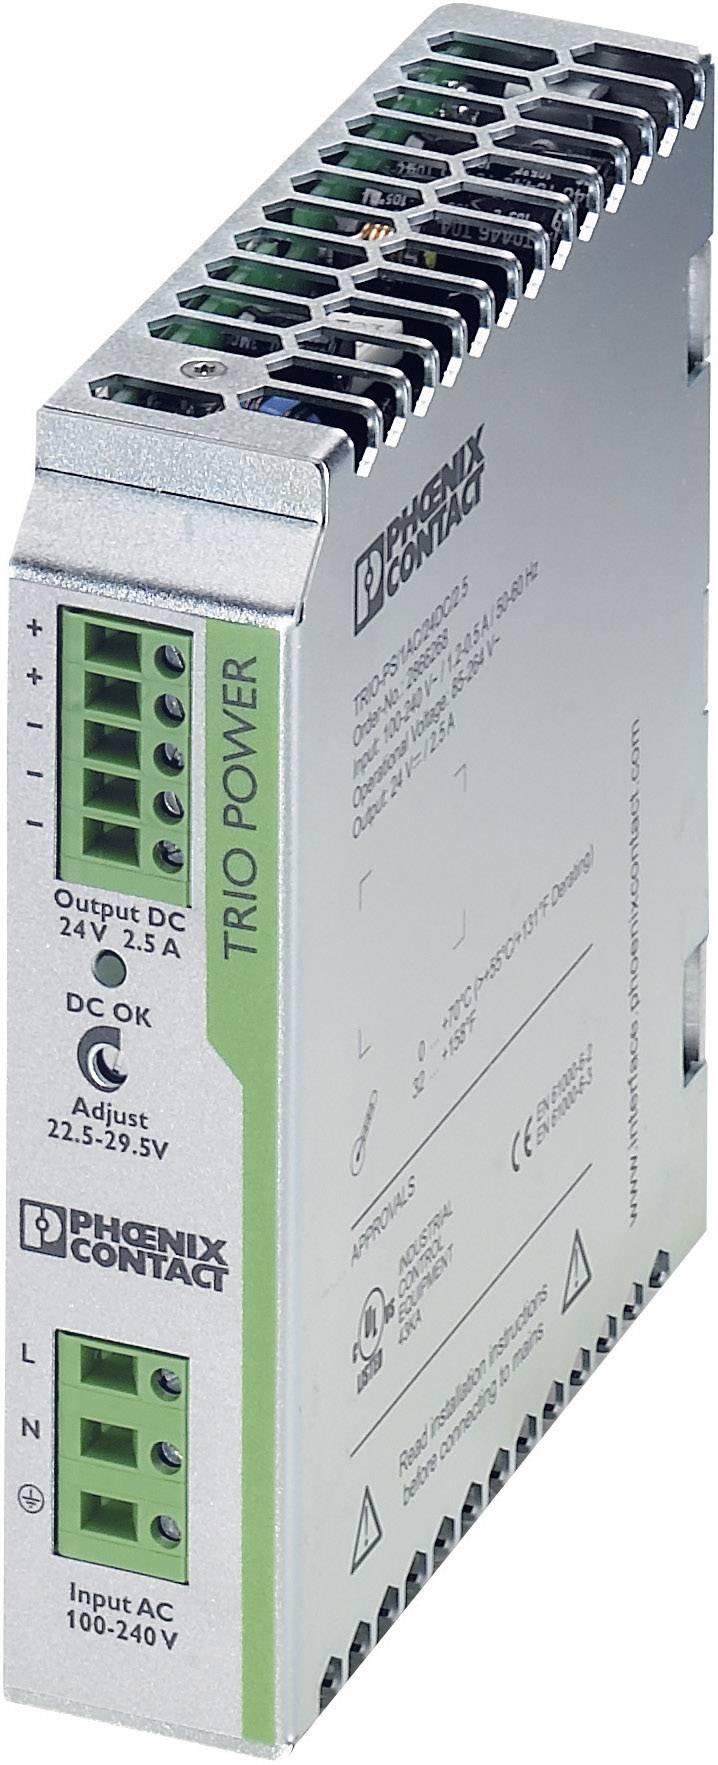 Sieťový zdroj na montážnu lištu (DIN lištu) Phoenix Contact TRIO-PS/1AC/24DC/2.5, 1 x, 24 V/DC, 2.5 A, 60 W